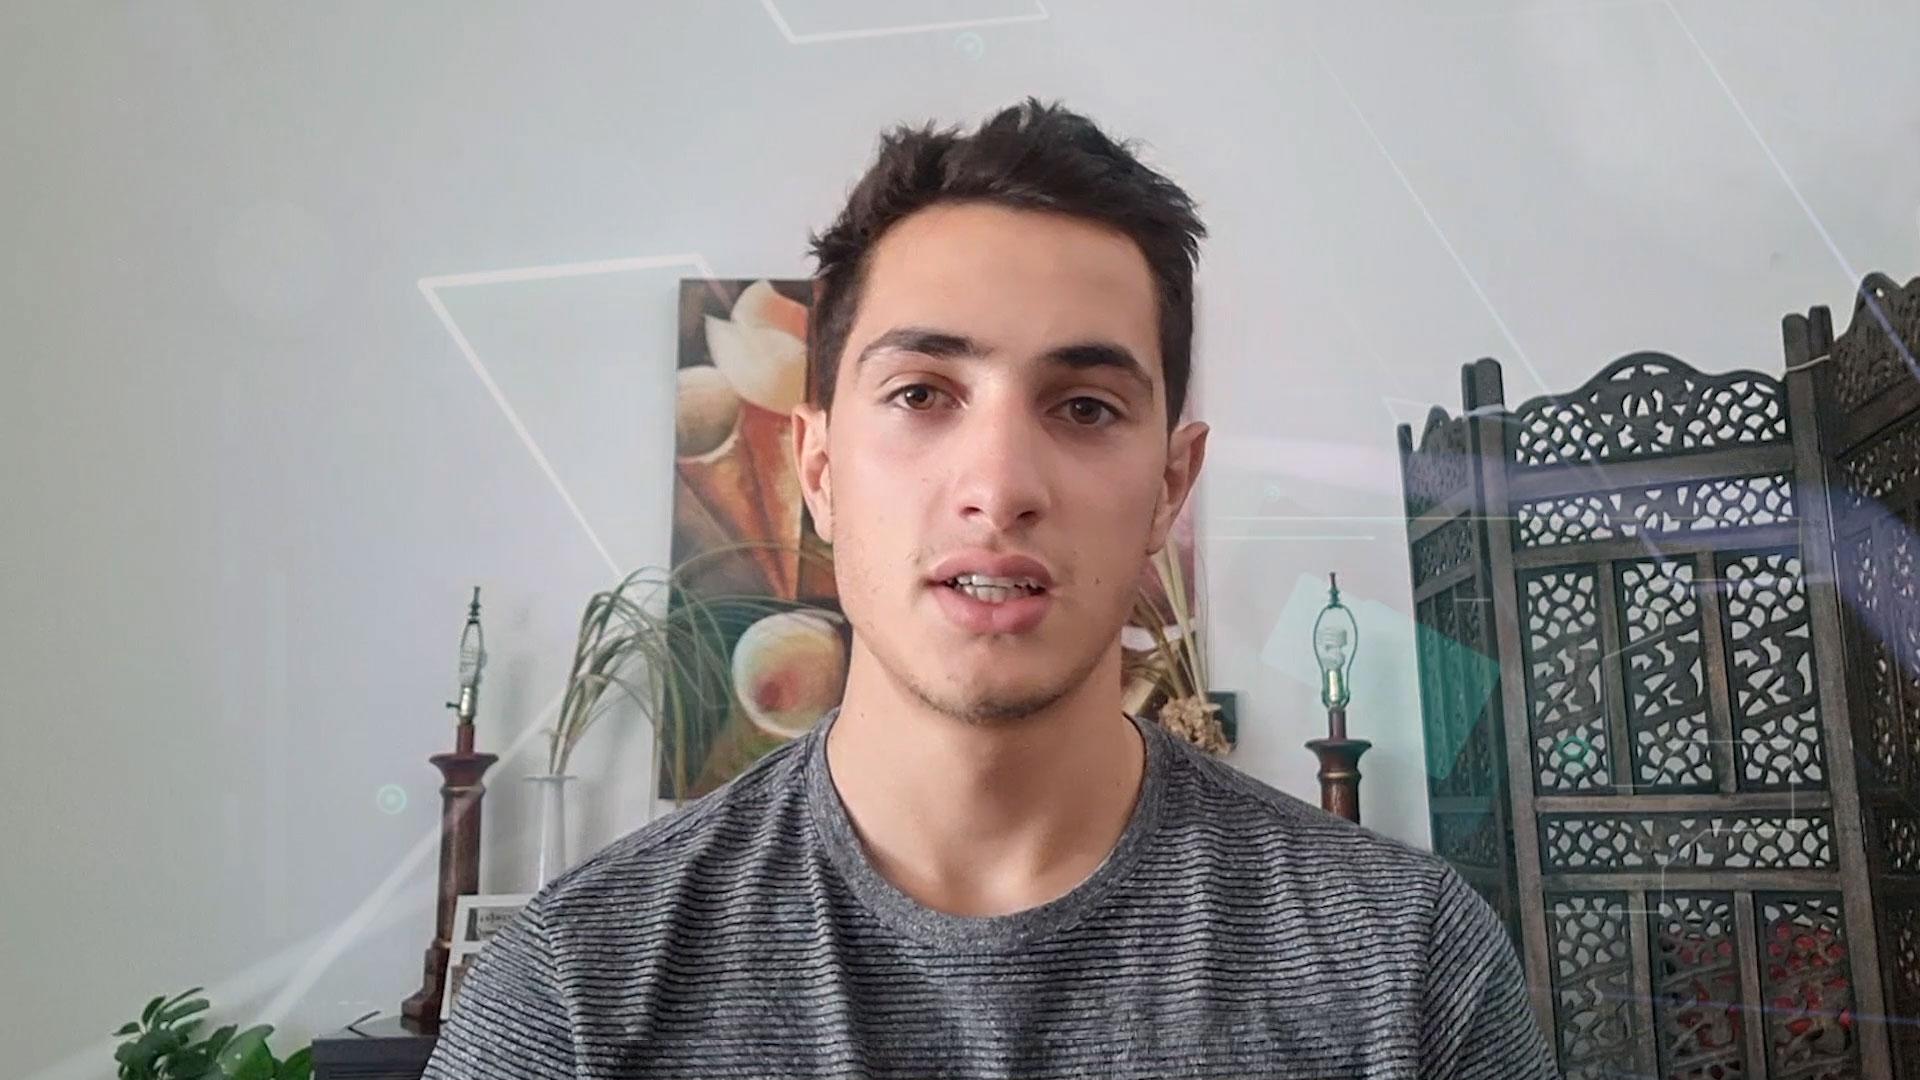 Santiago Dutra